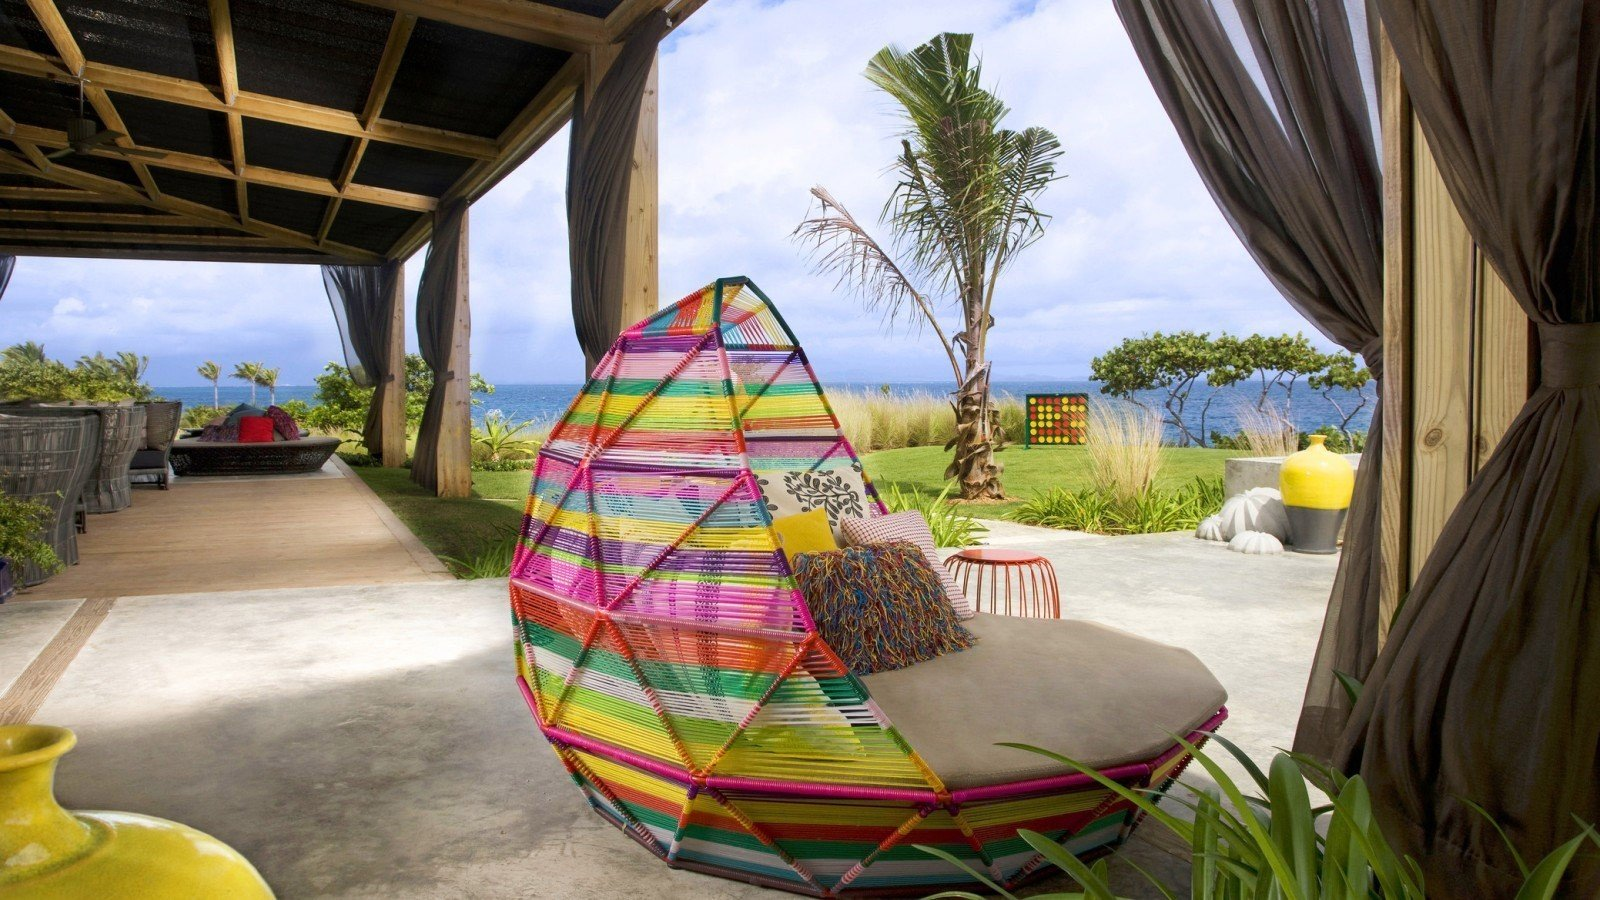 Hotels leisure Resort vacation amusement park furniture